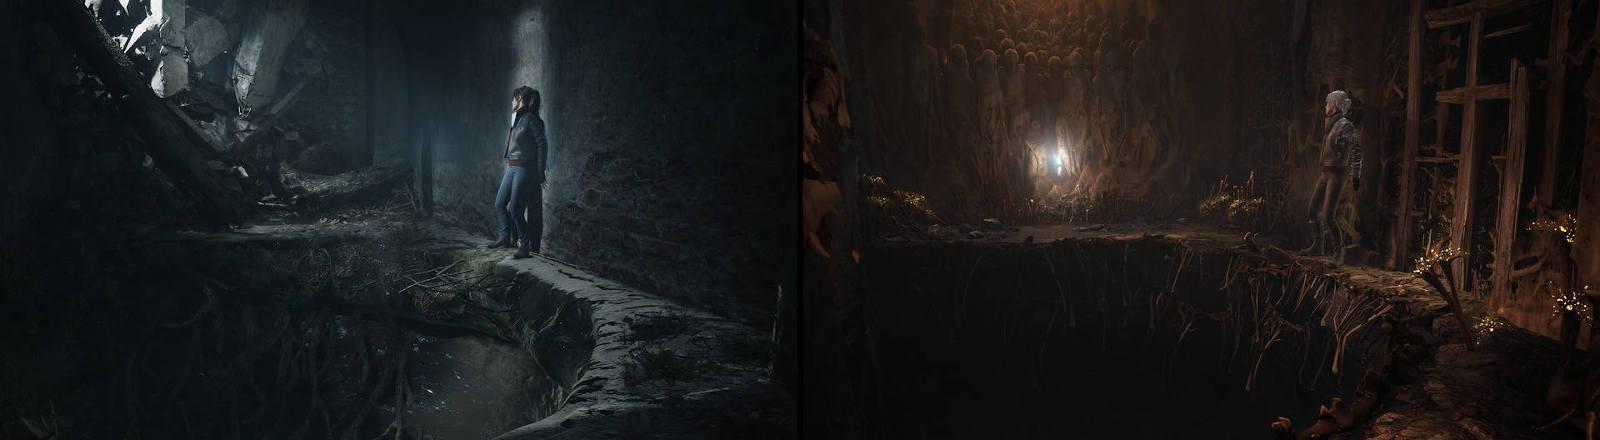 "Screenshot aus dem Game ""The Medium"""